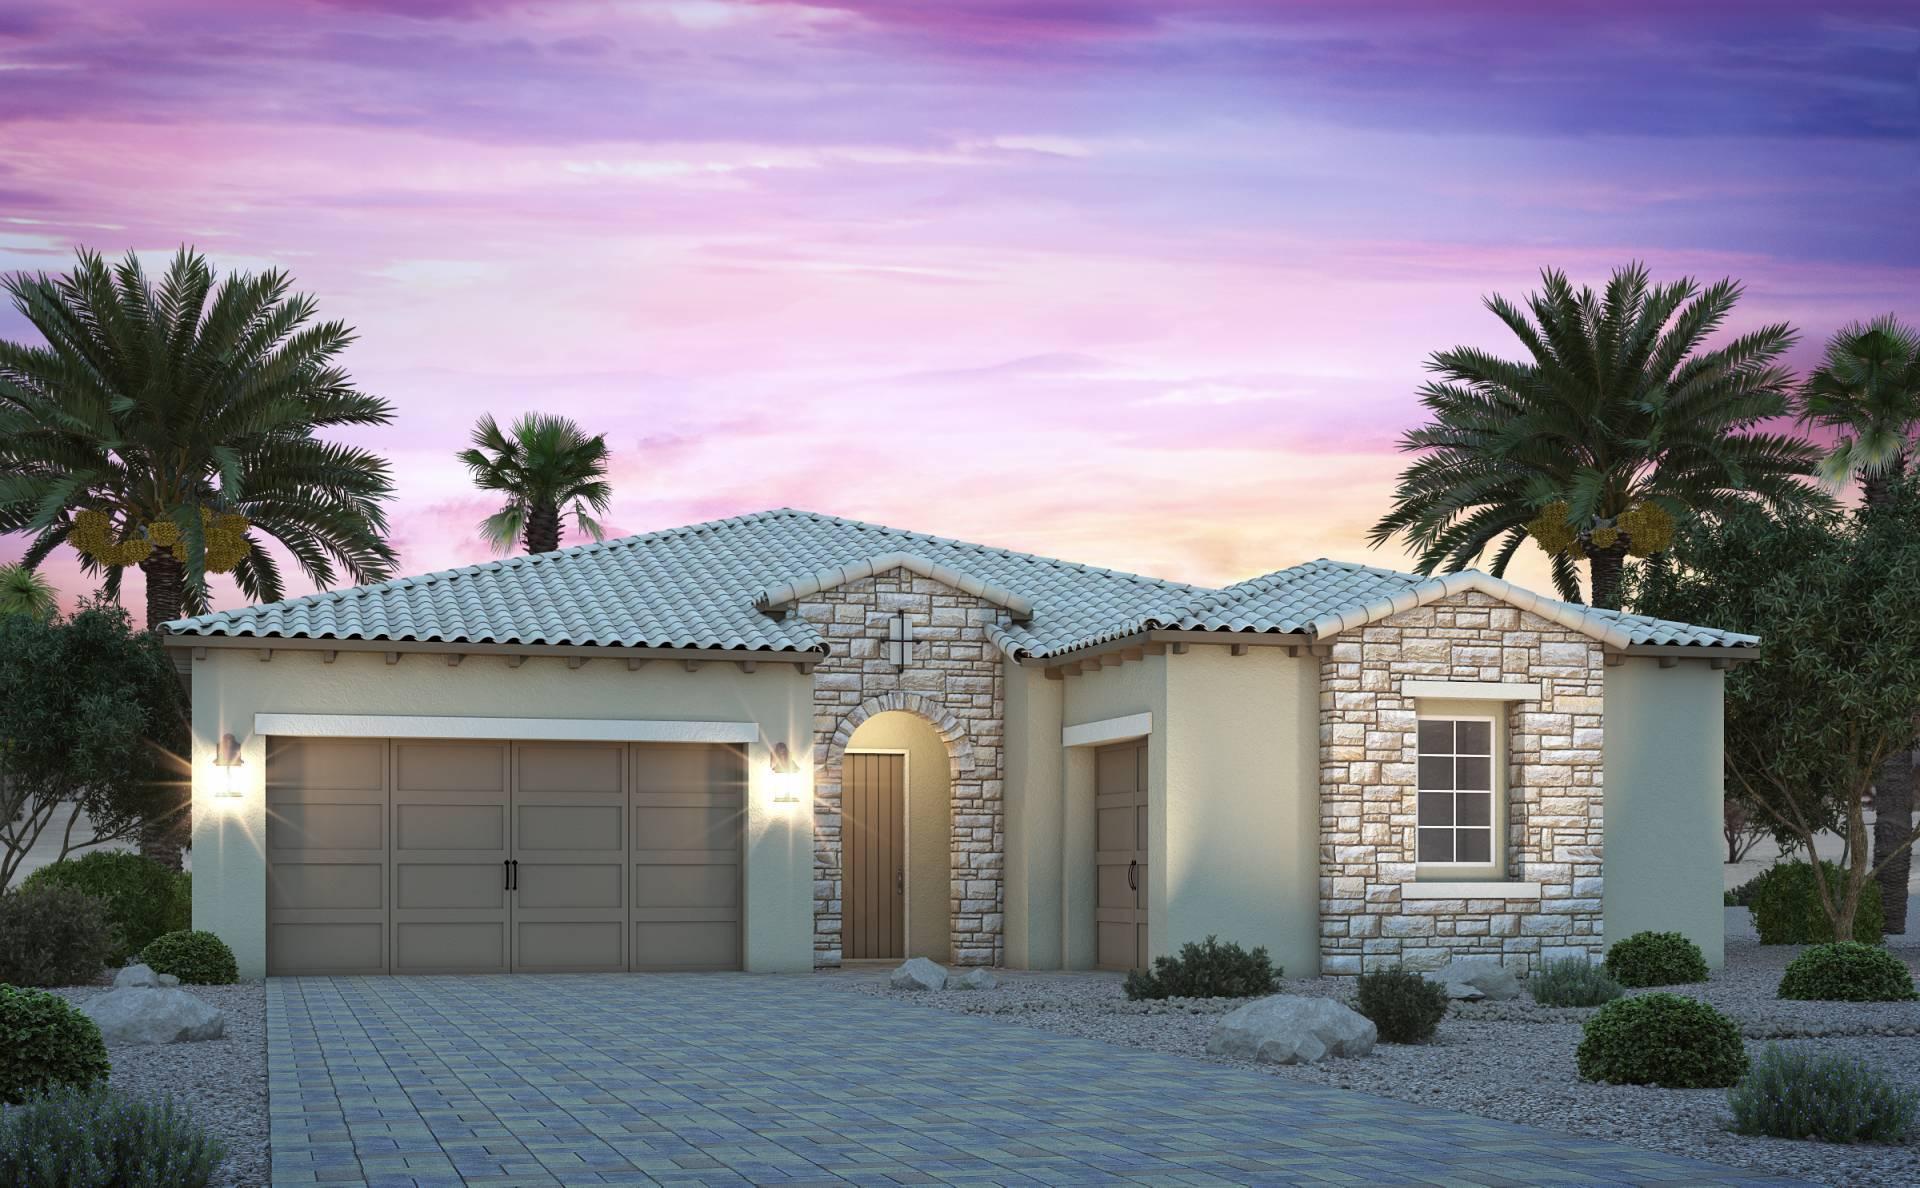 Homes for sale in las vegas - Homes For Sale In Las Vegas 37